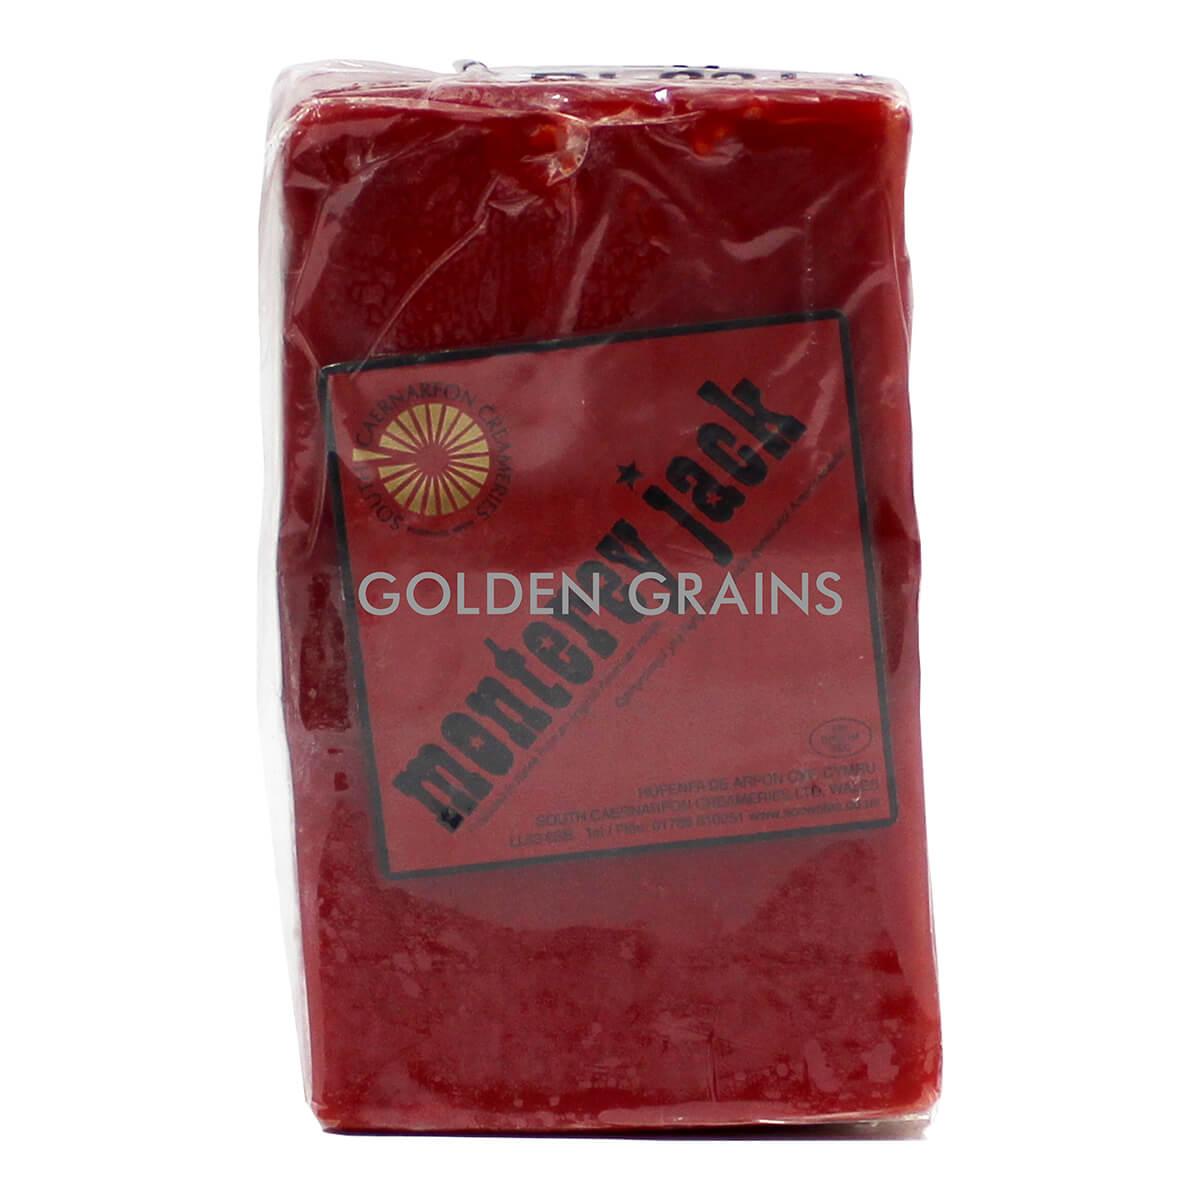 Golden Grains Dubai Export - Montery Jack Cheese - Front.jpg